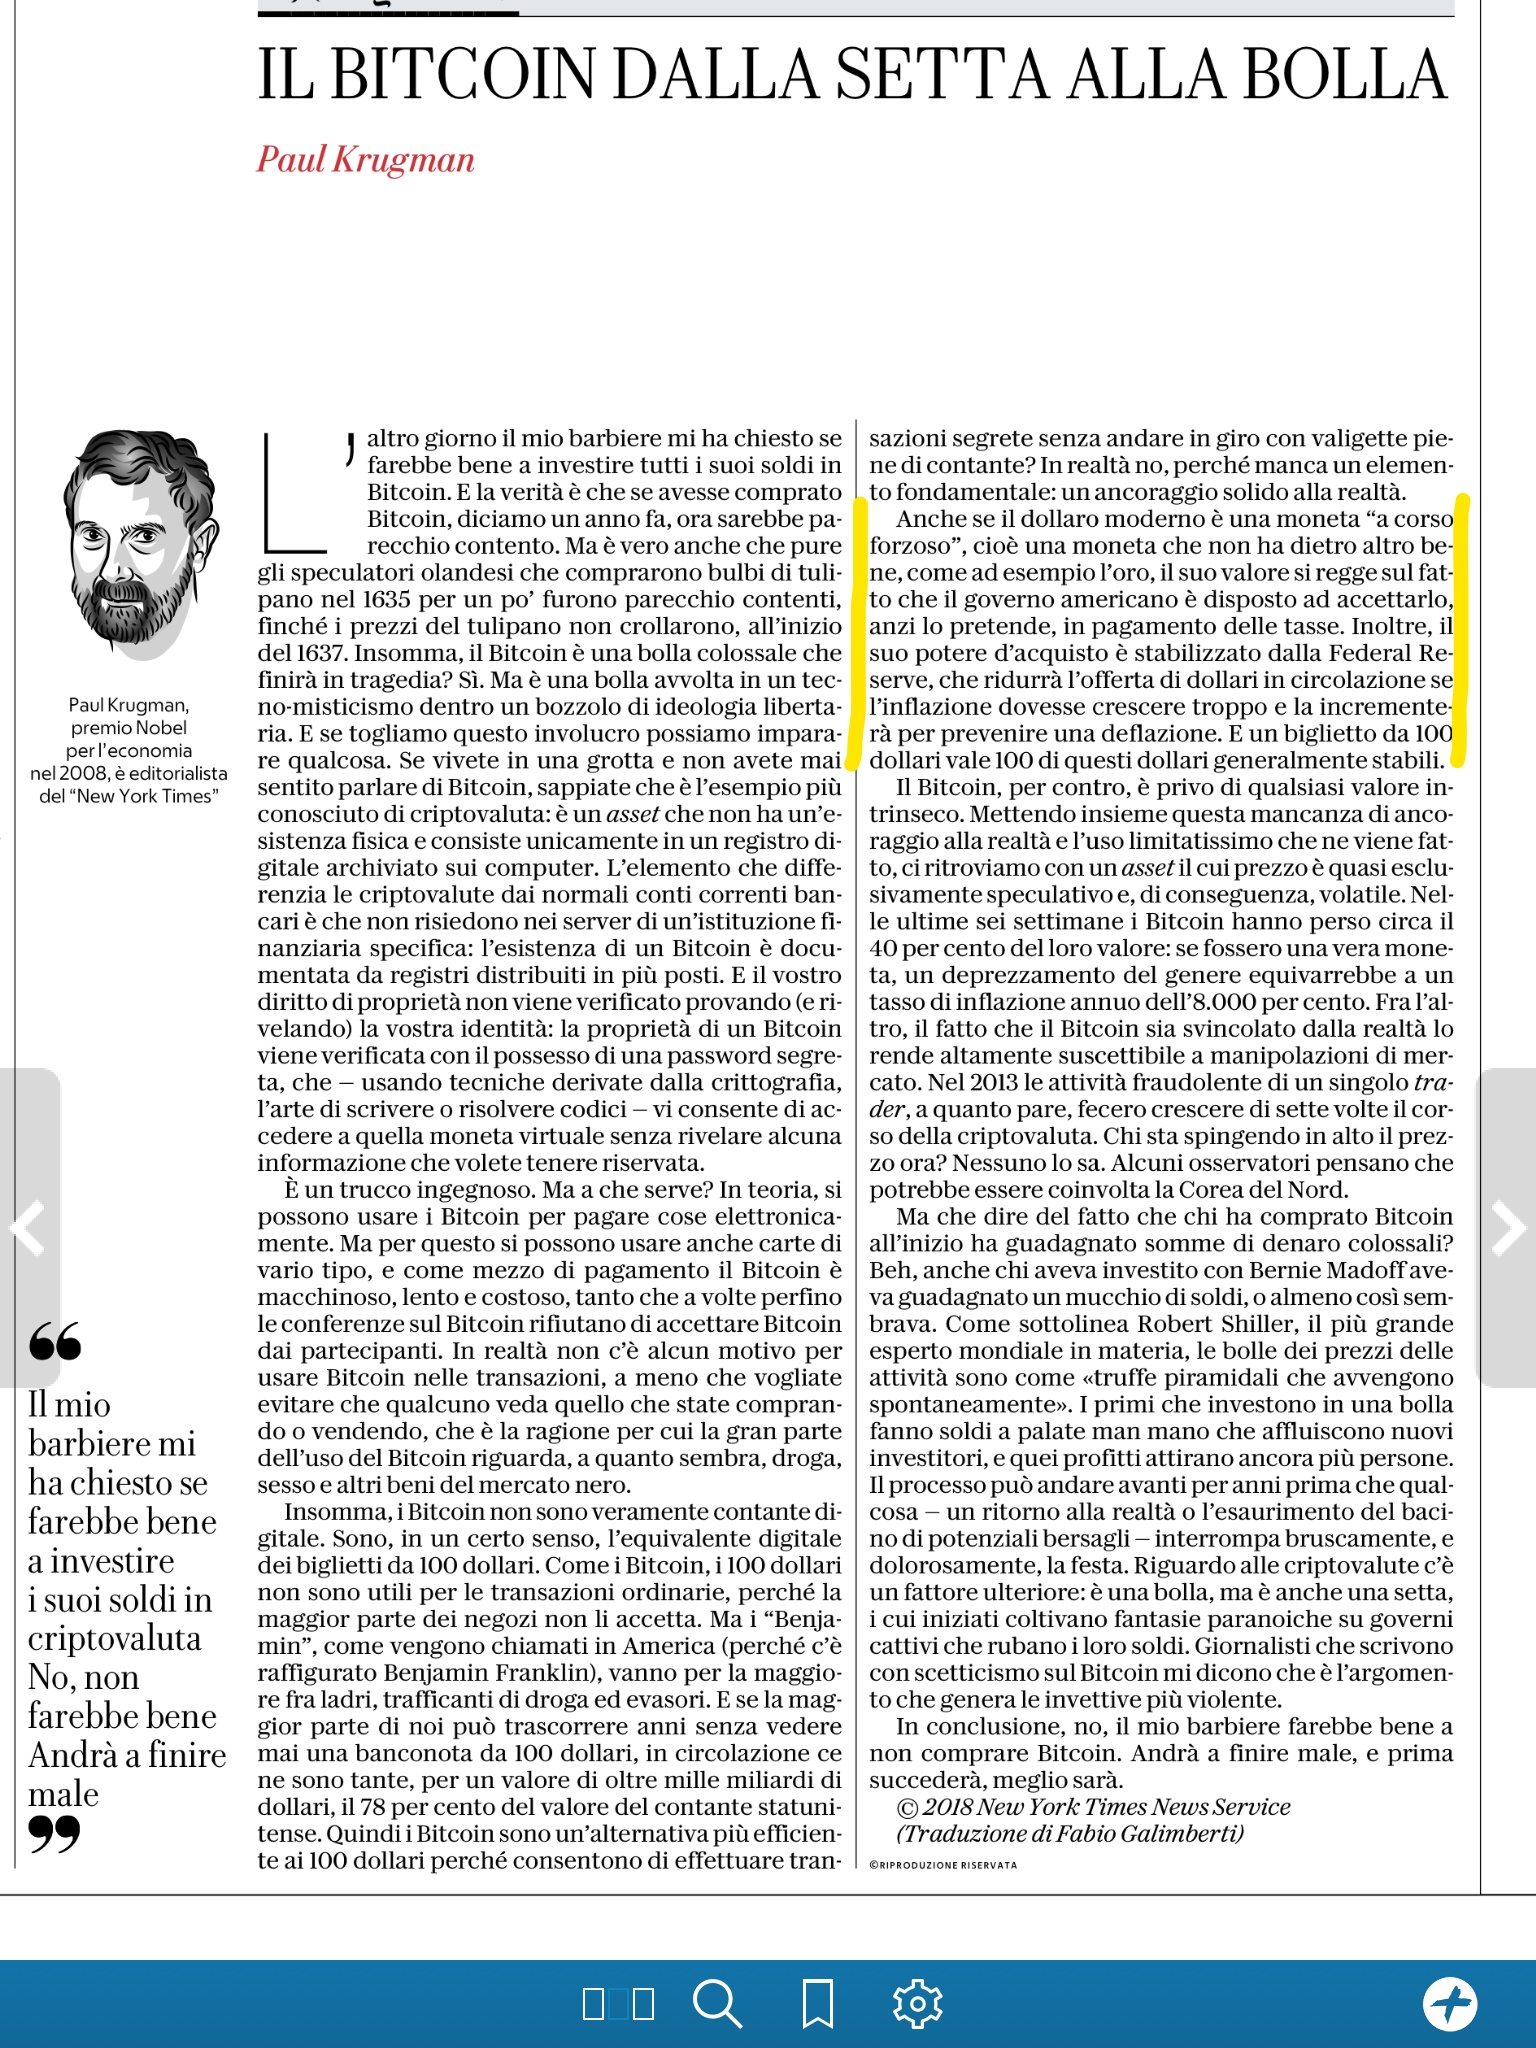 krugman su bitcoin come fare 1 bitcoin a settimana